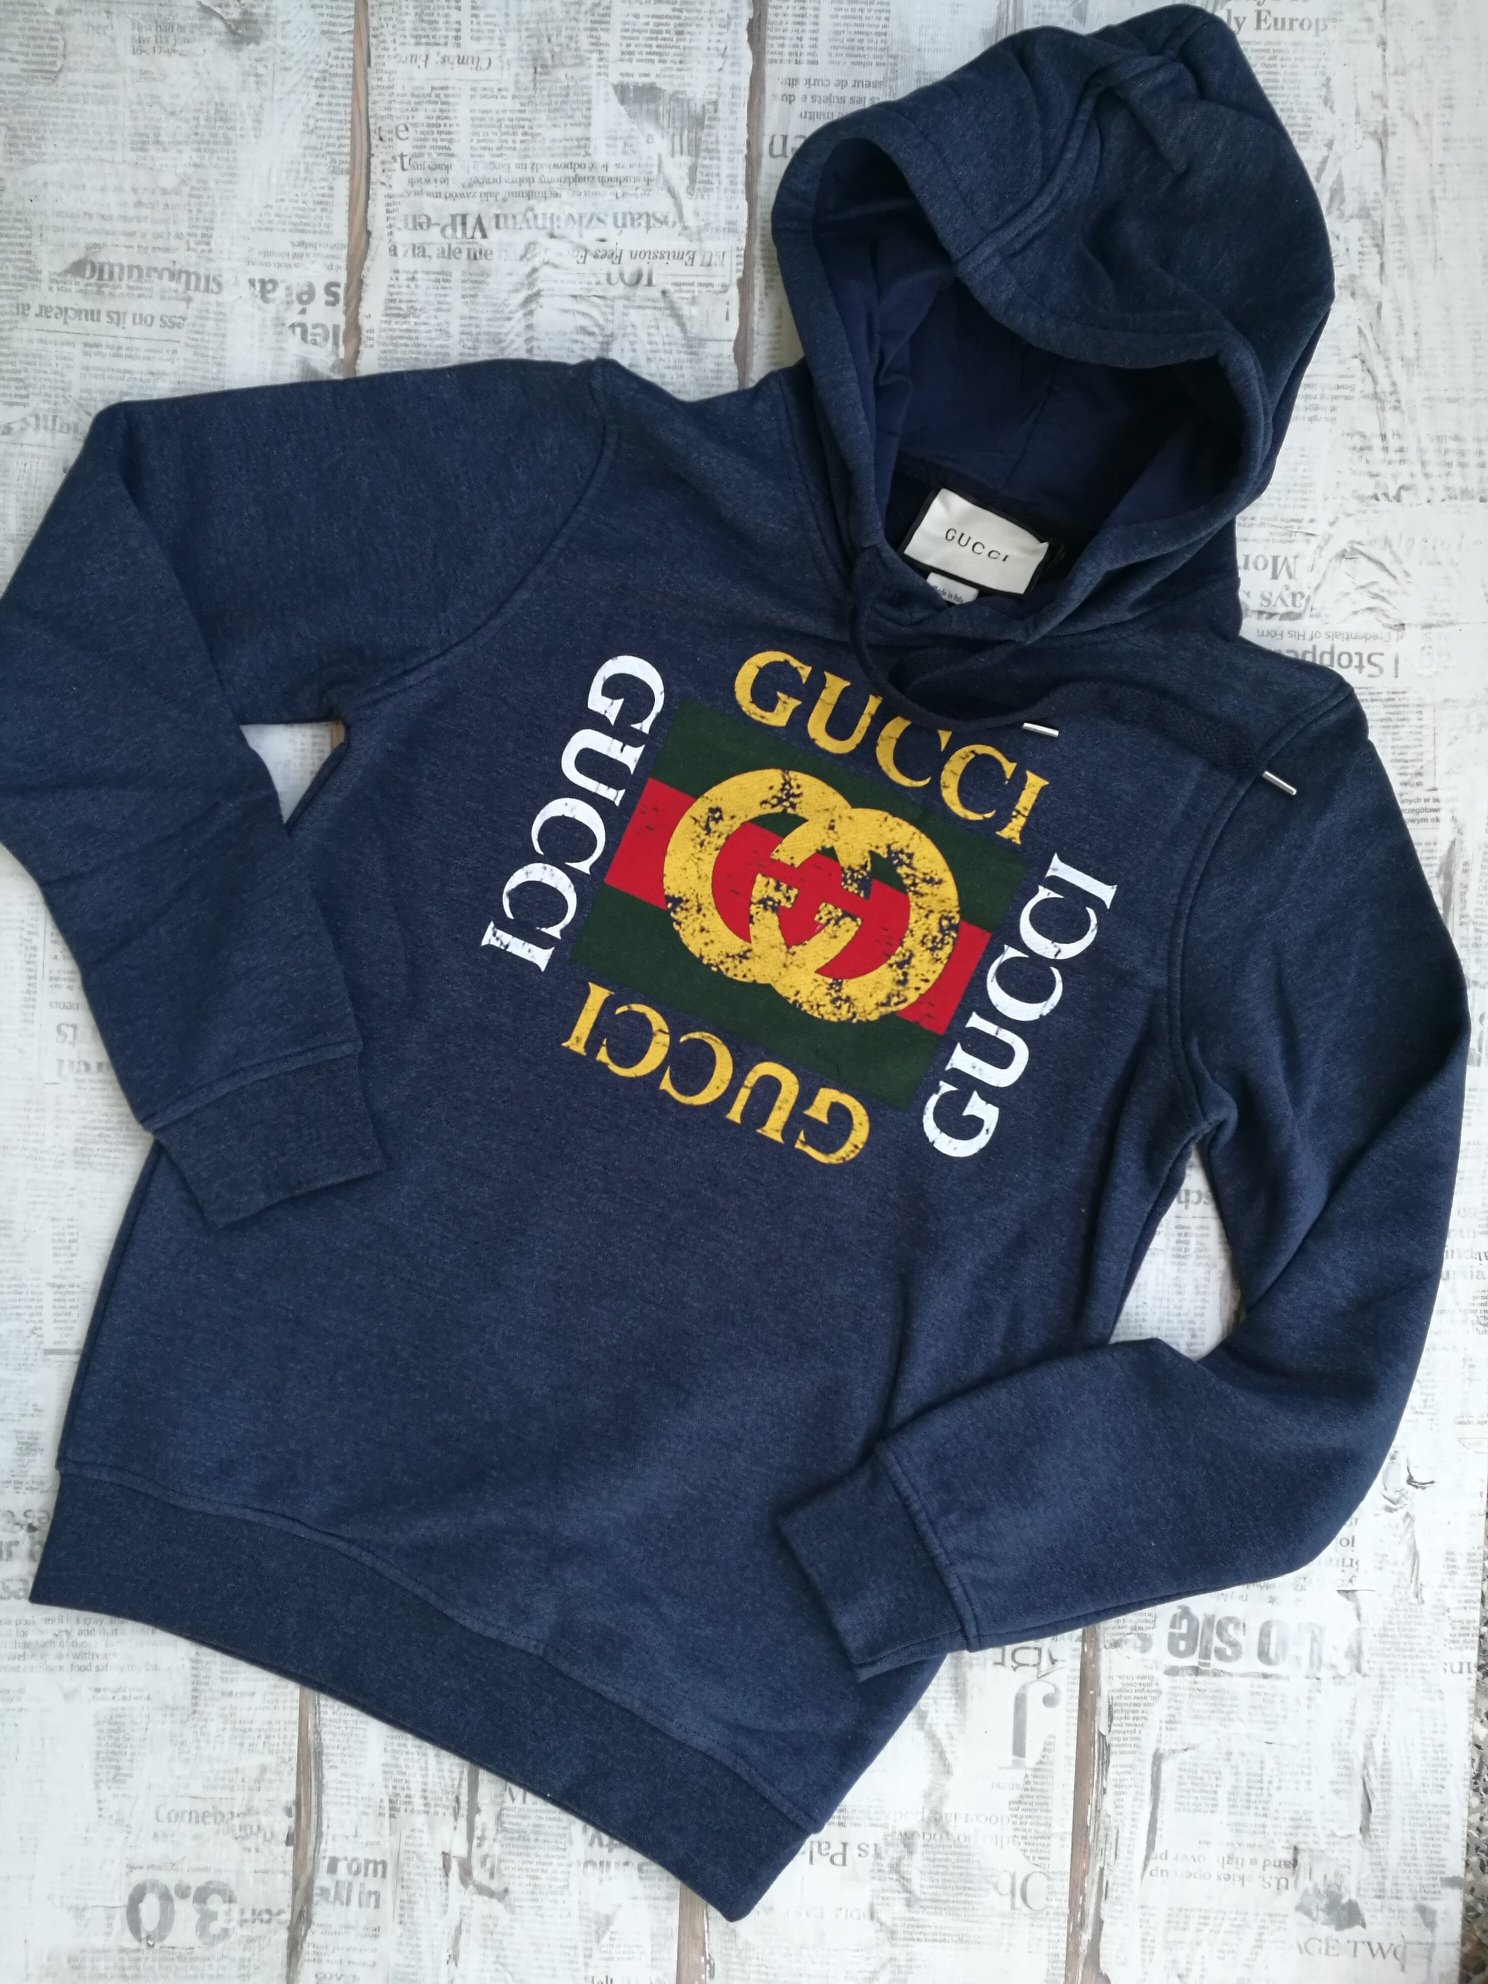 913fee27 Gucci Dark Blue Cotton Hooded with Gucci Logo Men's Sweatshirt on ...